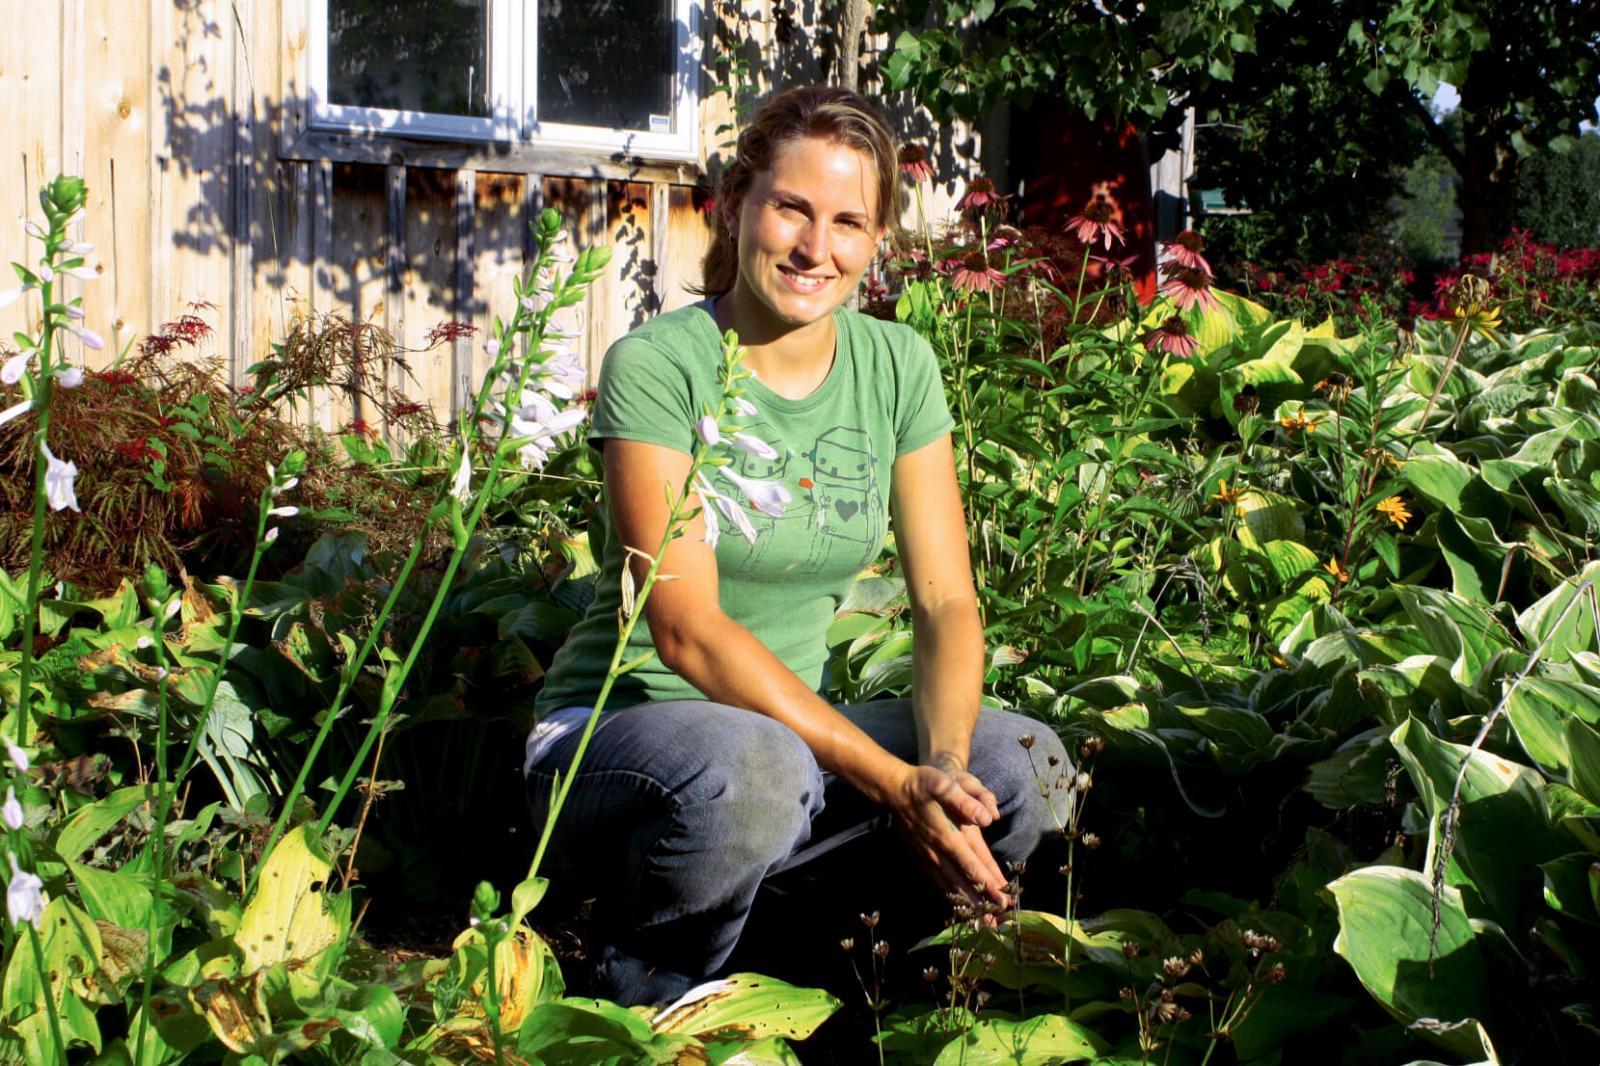 Summer intern Marette Sharpe has ideas to promote horticulture's future.